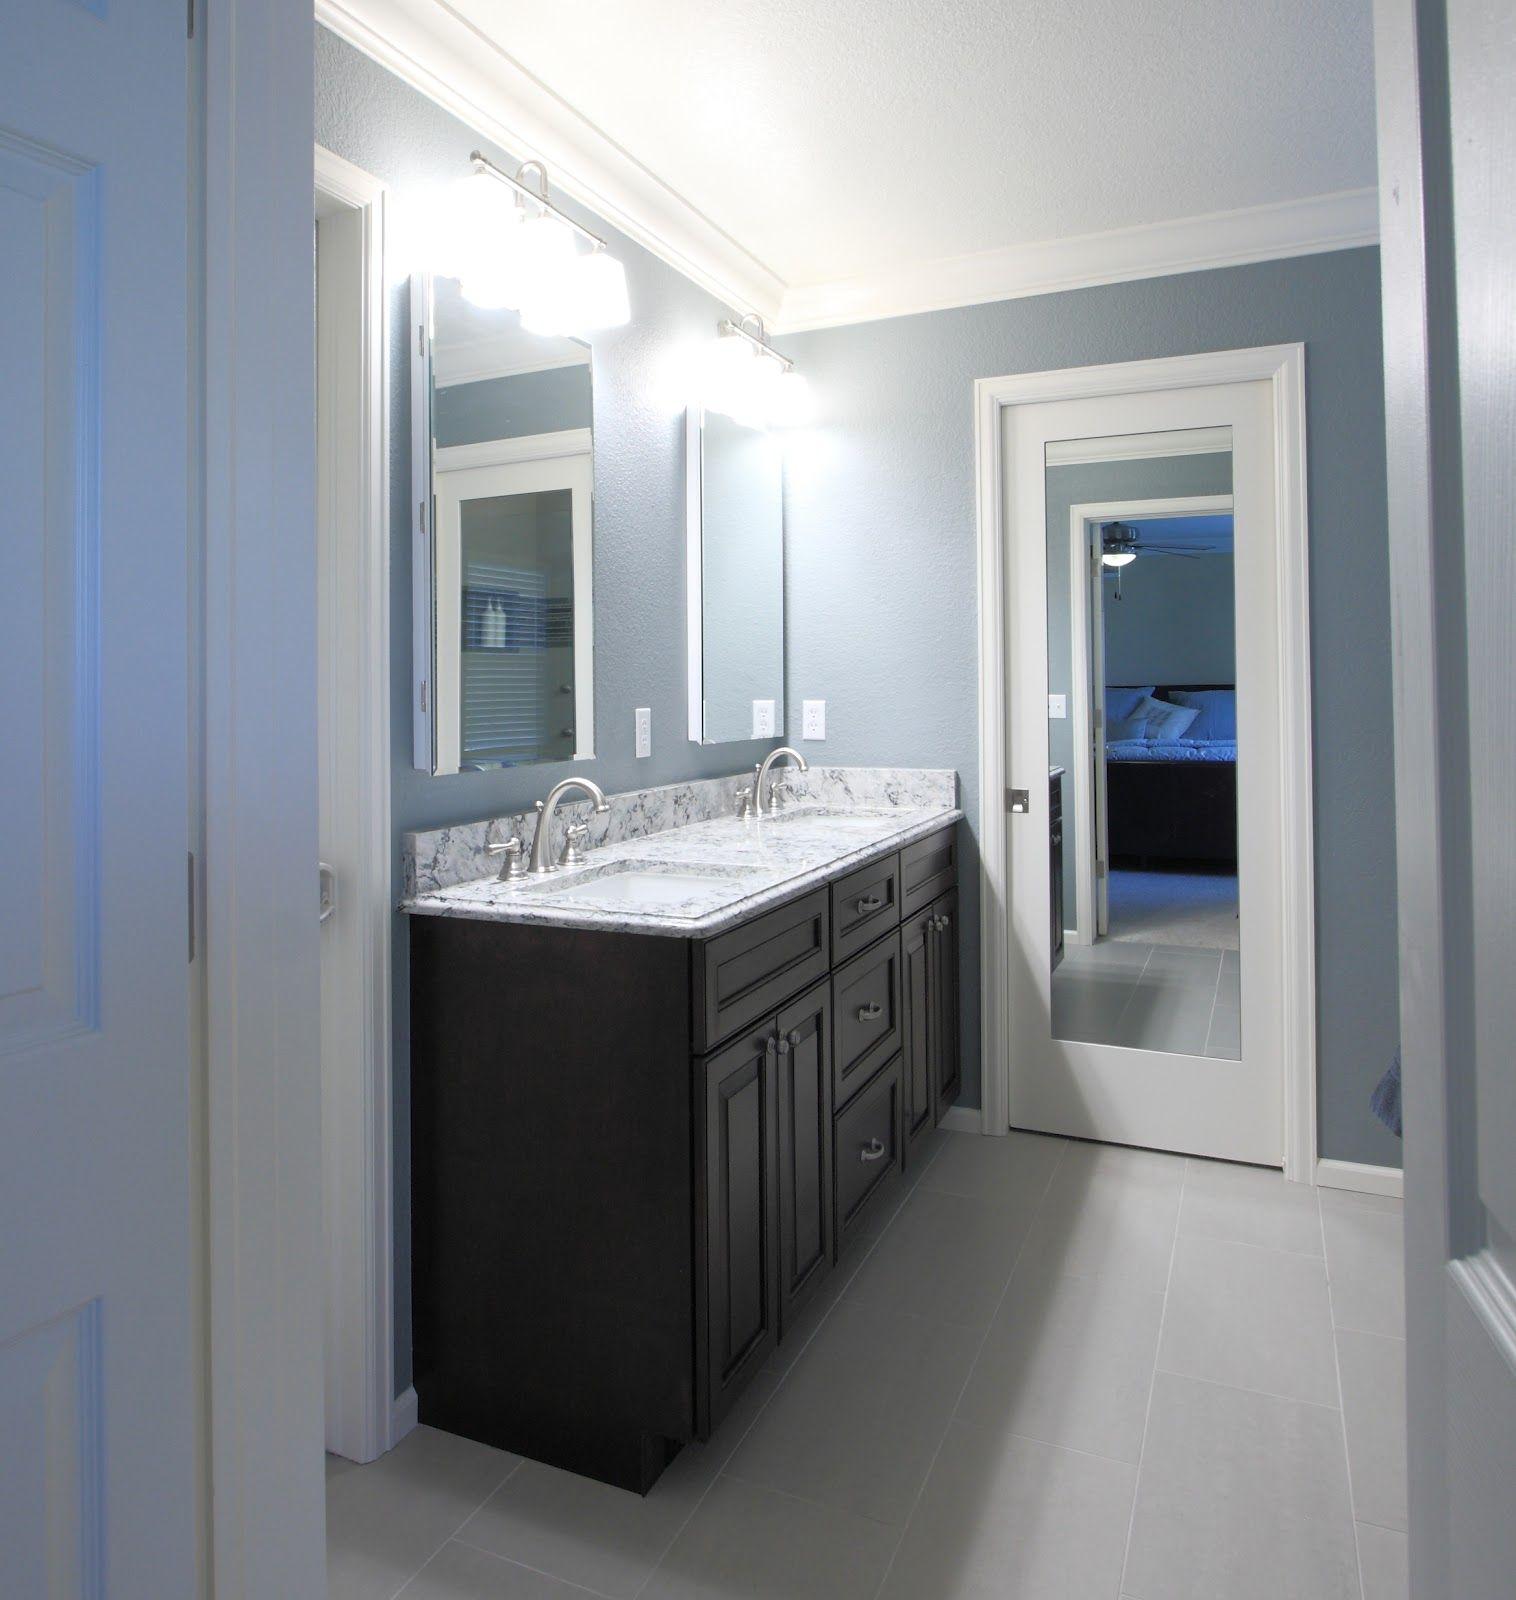 Bathroom pocket door with mirror